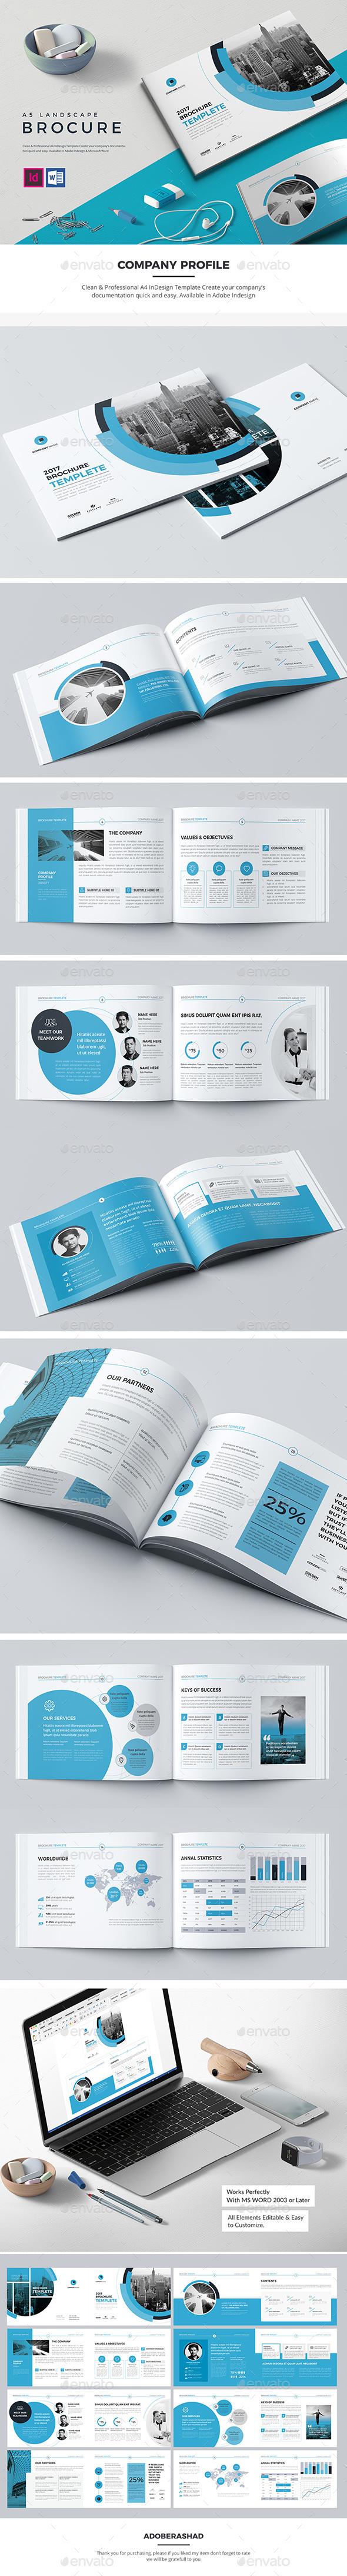 Co Landscape Brochure 16 Pages - Corporate Brochures